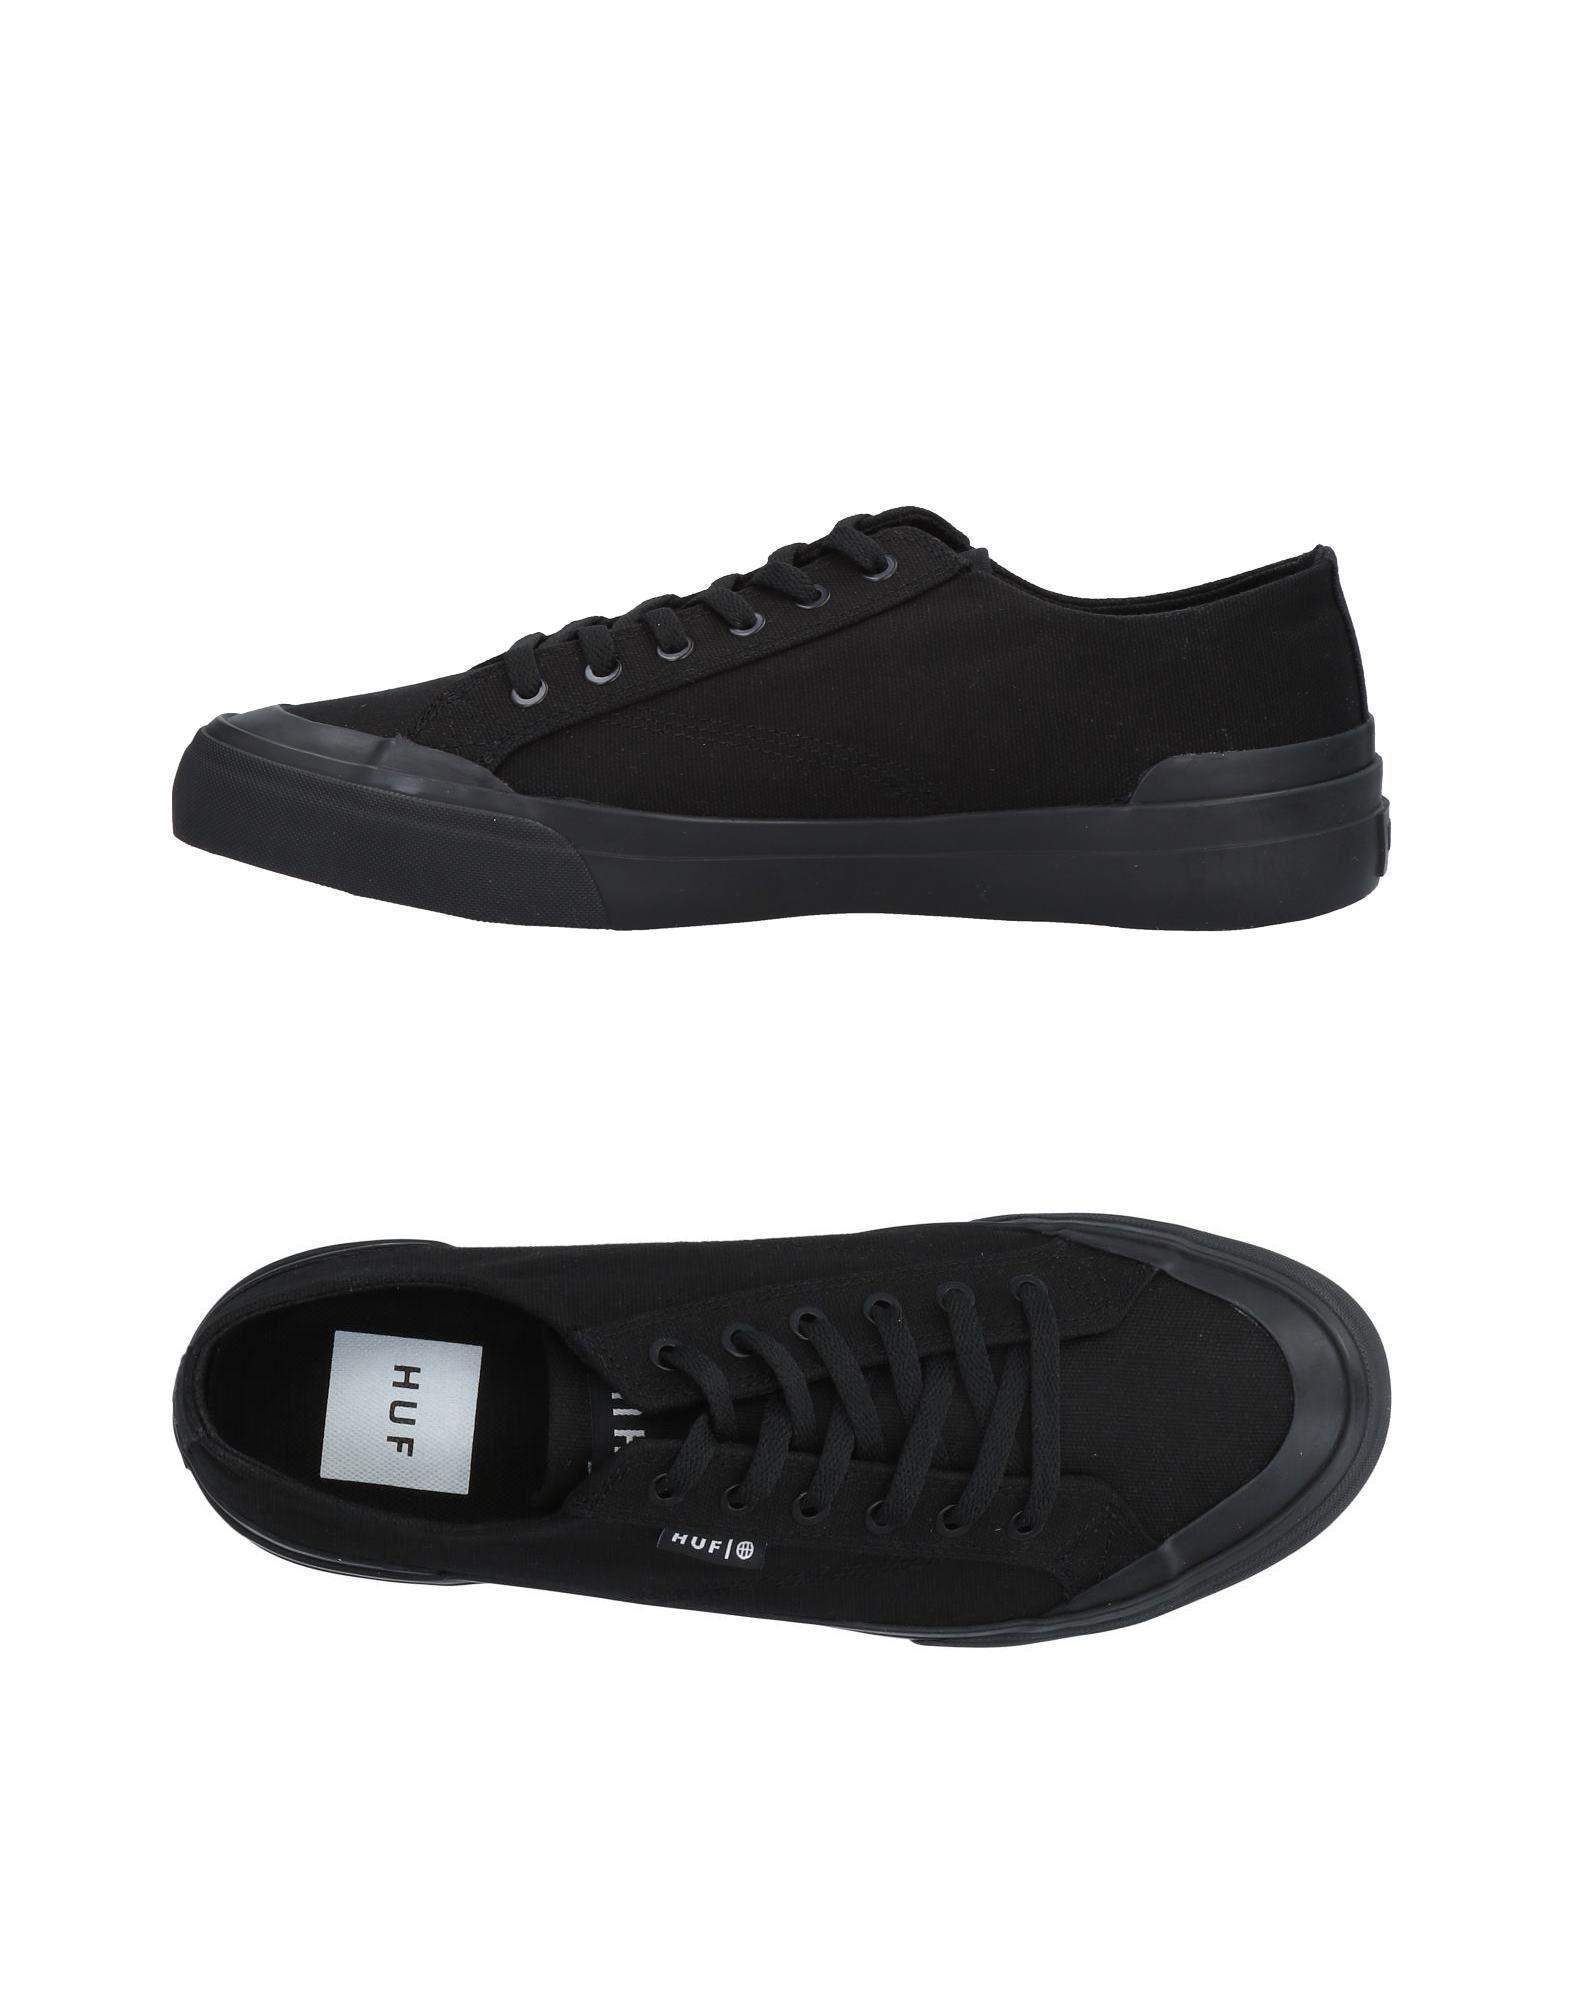 cdcea550ef13b Huf - Black Low-tops & Sneakers for Men - Lyst. View fullscreen